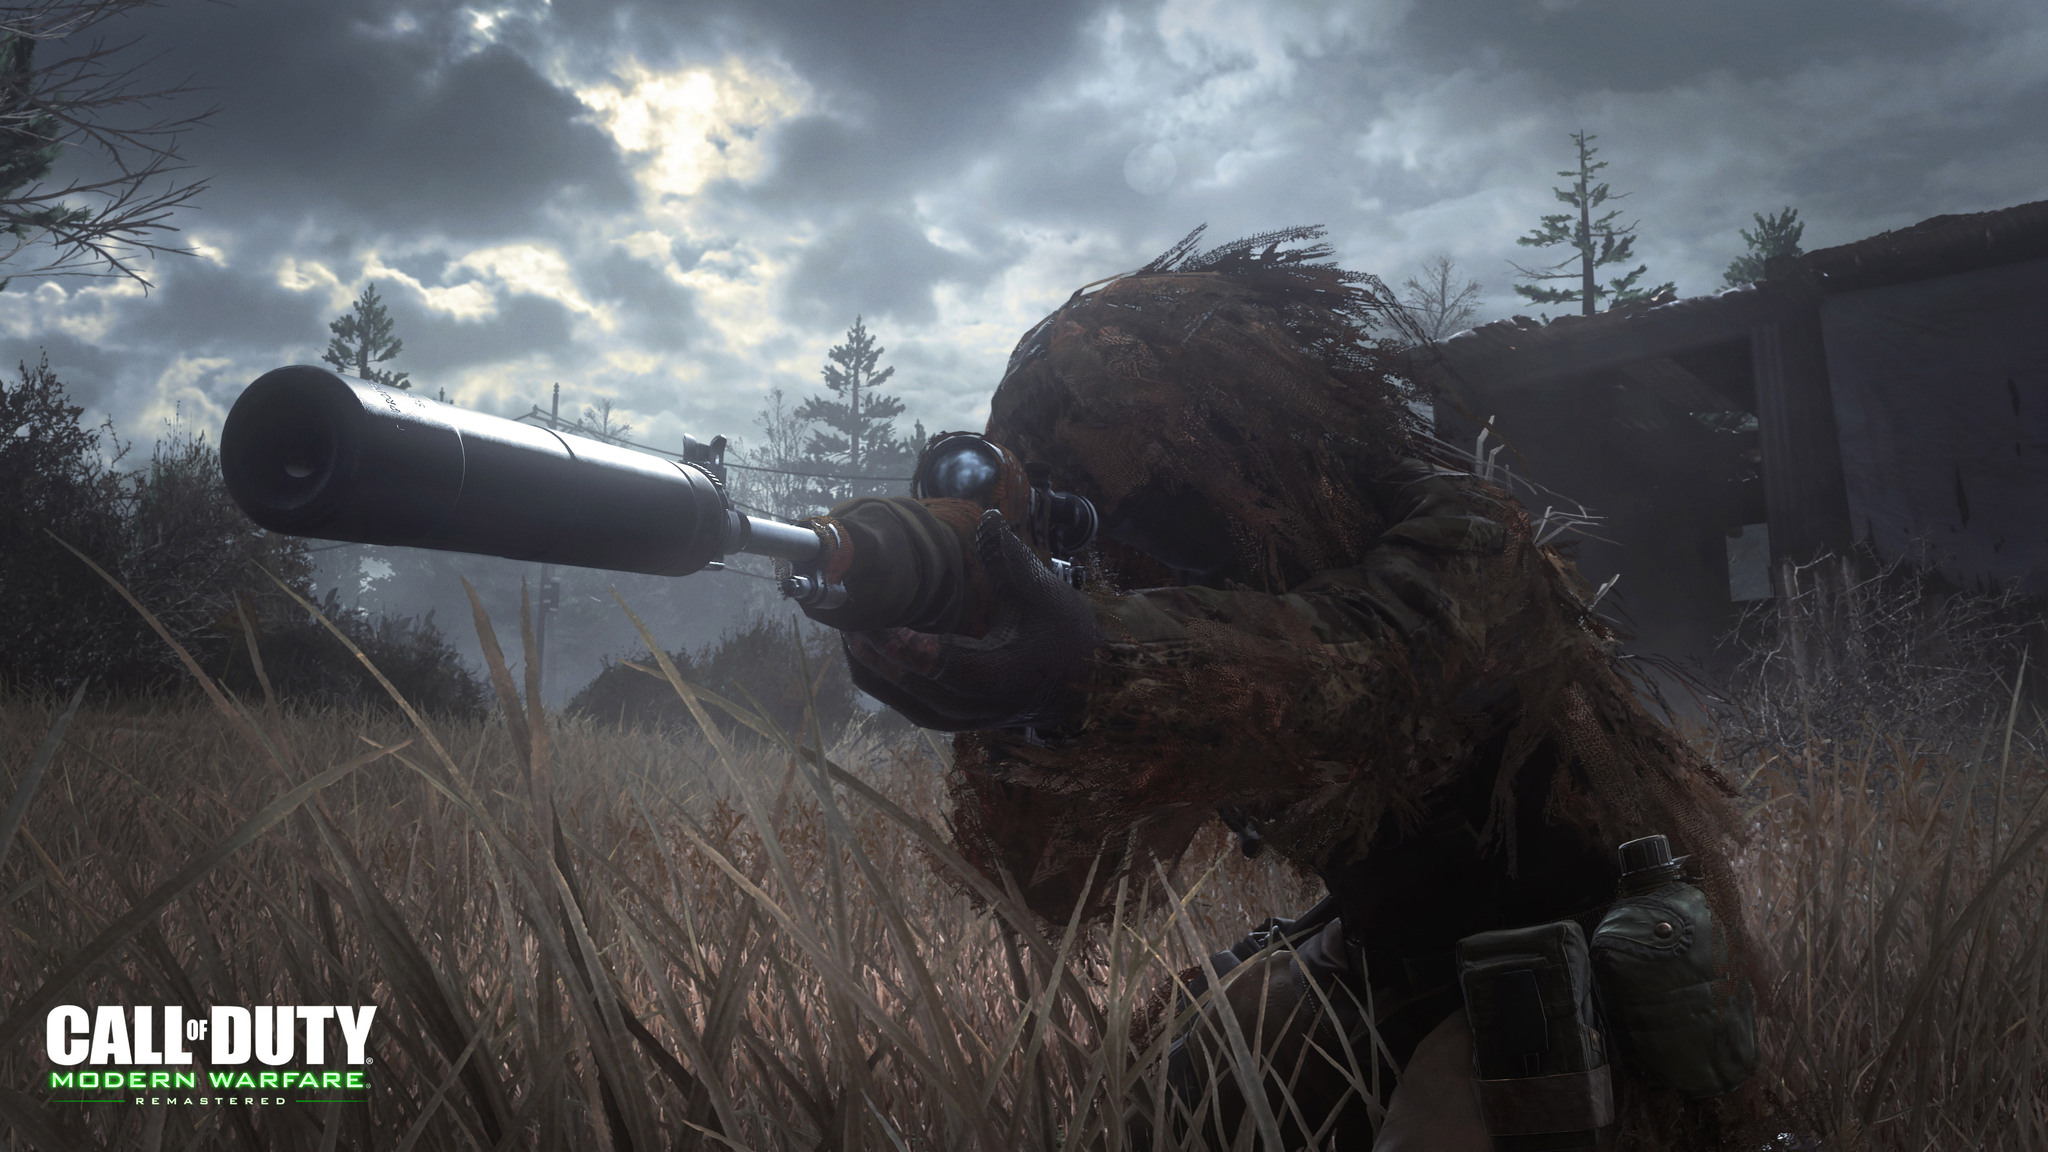 2048x1152 Call Of Duty Modern Warfare Remastered 2048x1152